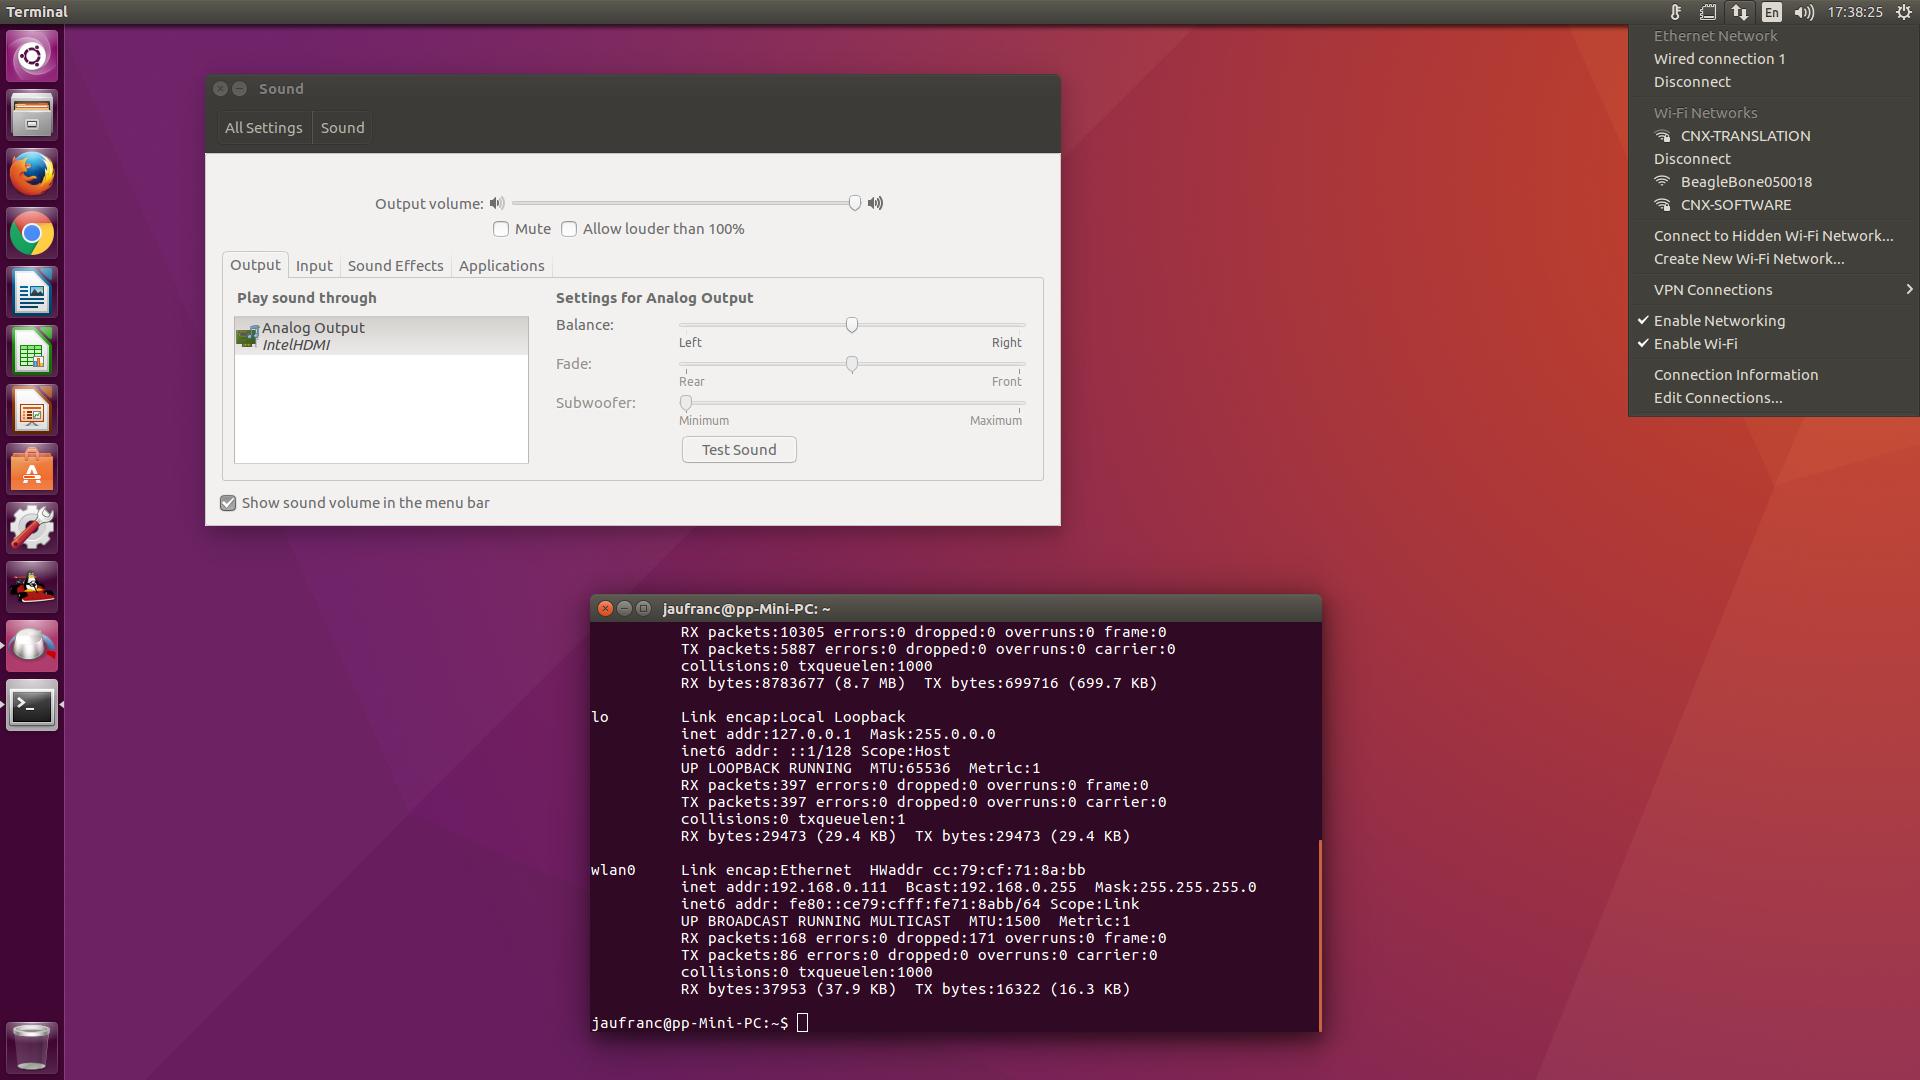 Updating Star Cloud PCG02U to Ubuntu 16 04 with WiFi and